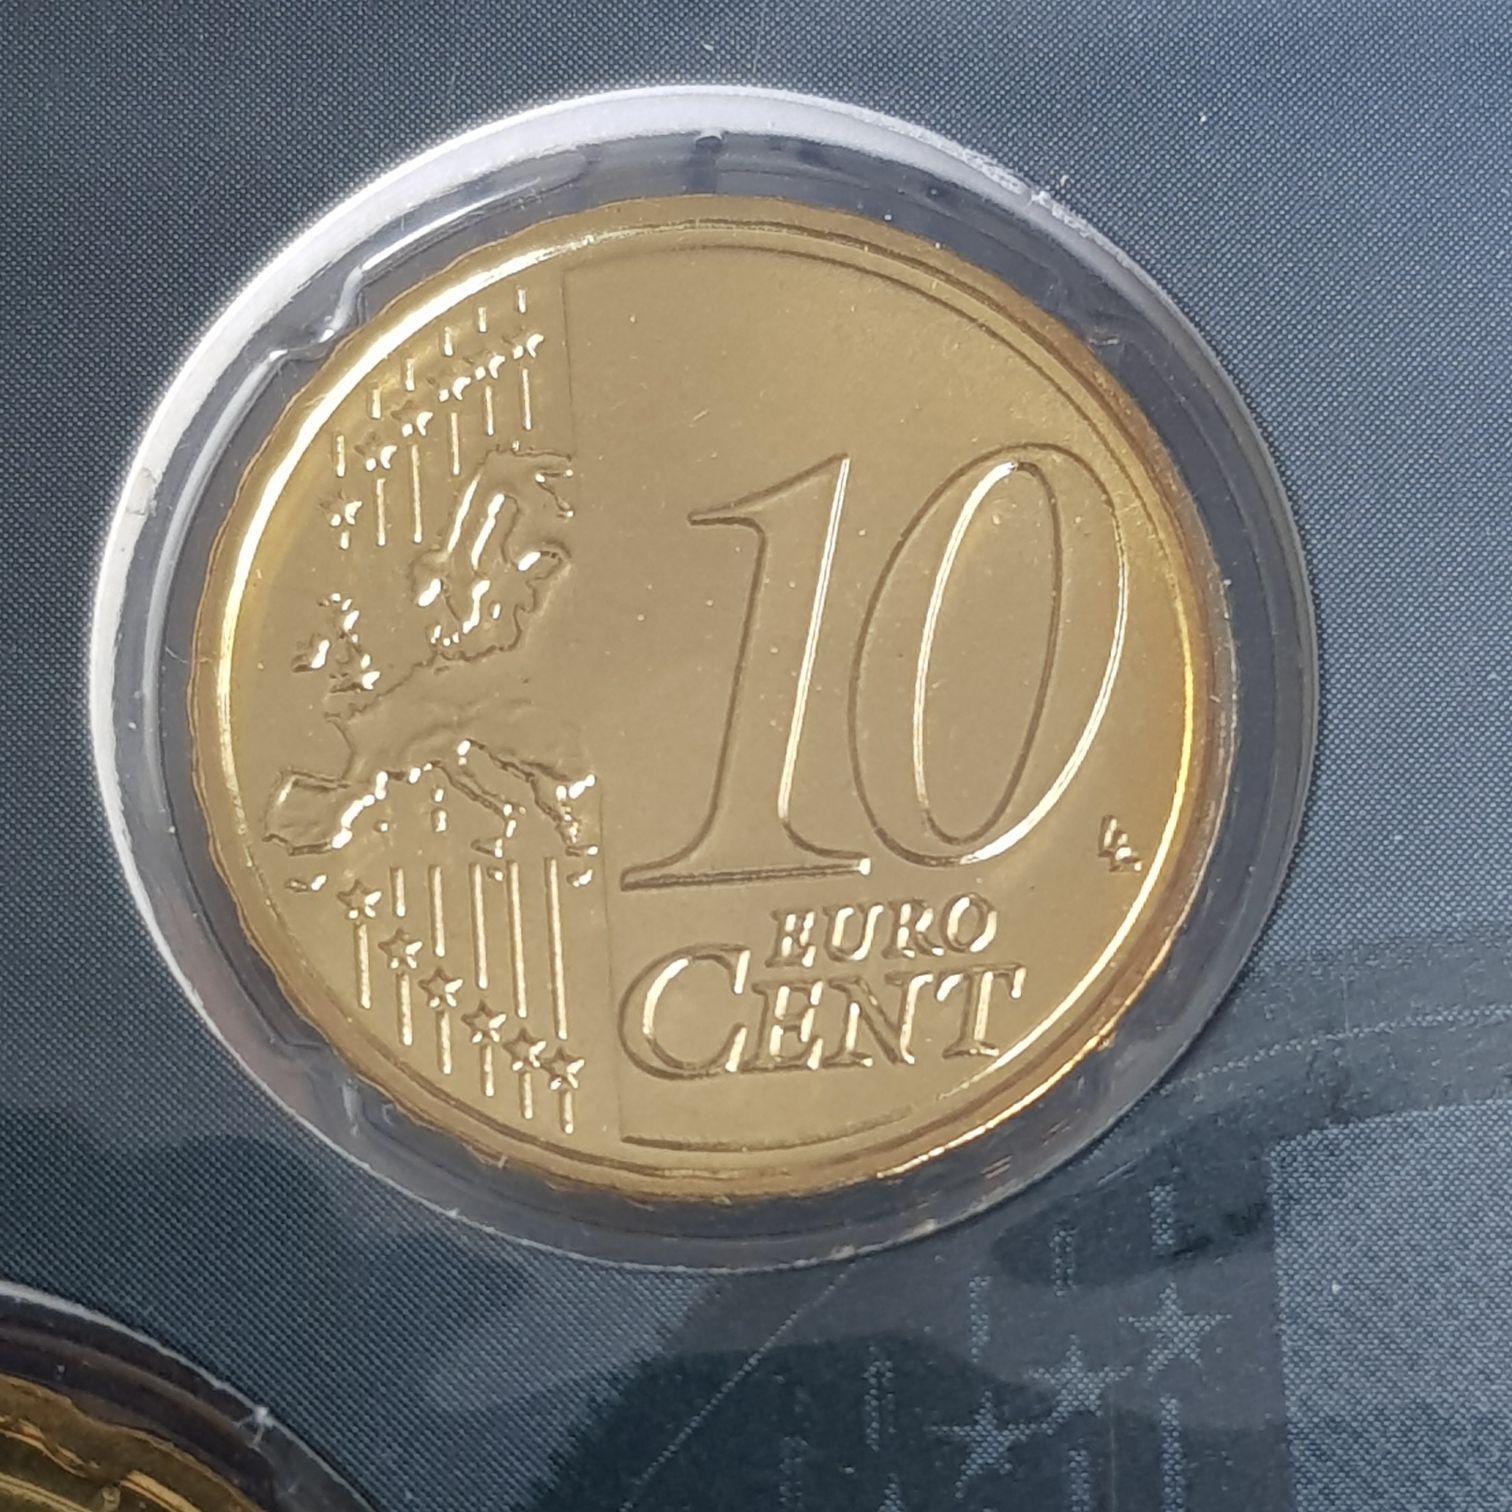 .1 Centavo De Euro Coin - $.10 (2015) front image (front cover)